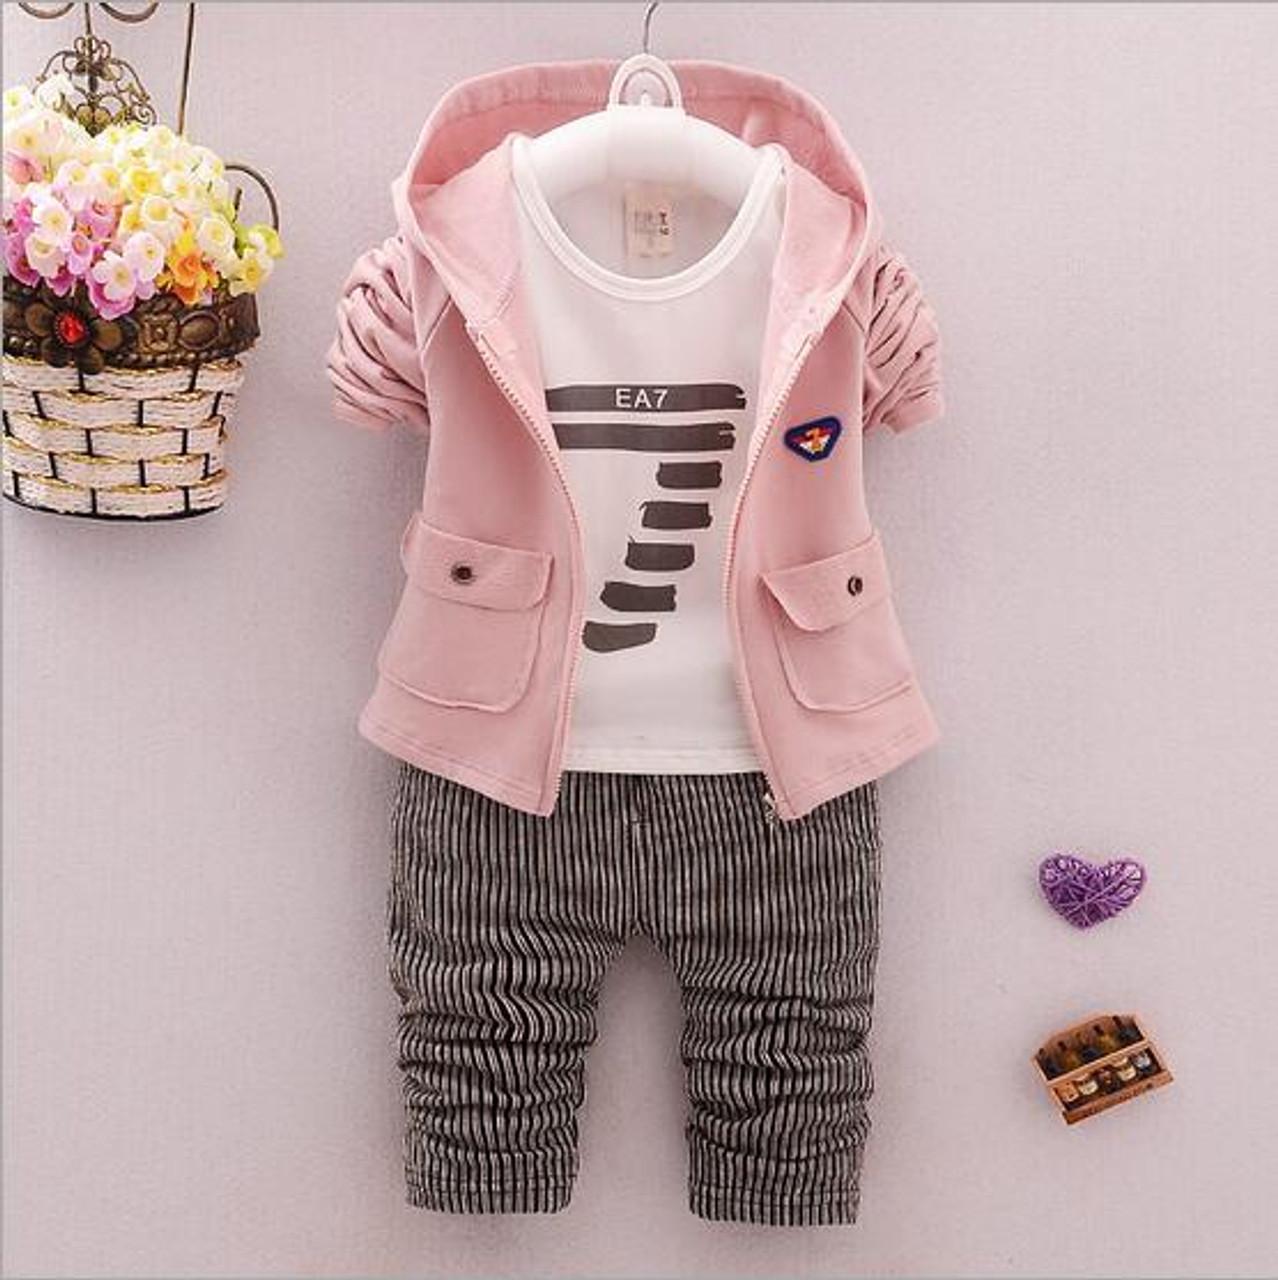 9b4d0584bd2b 3 pcs baby boy clothing set boys suit kids spring jacket infant ...